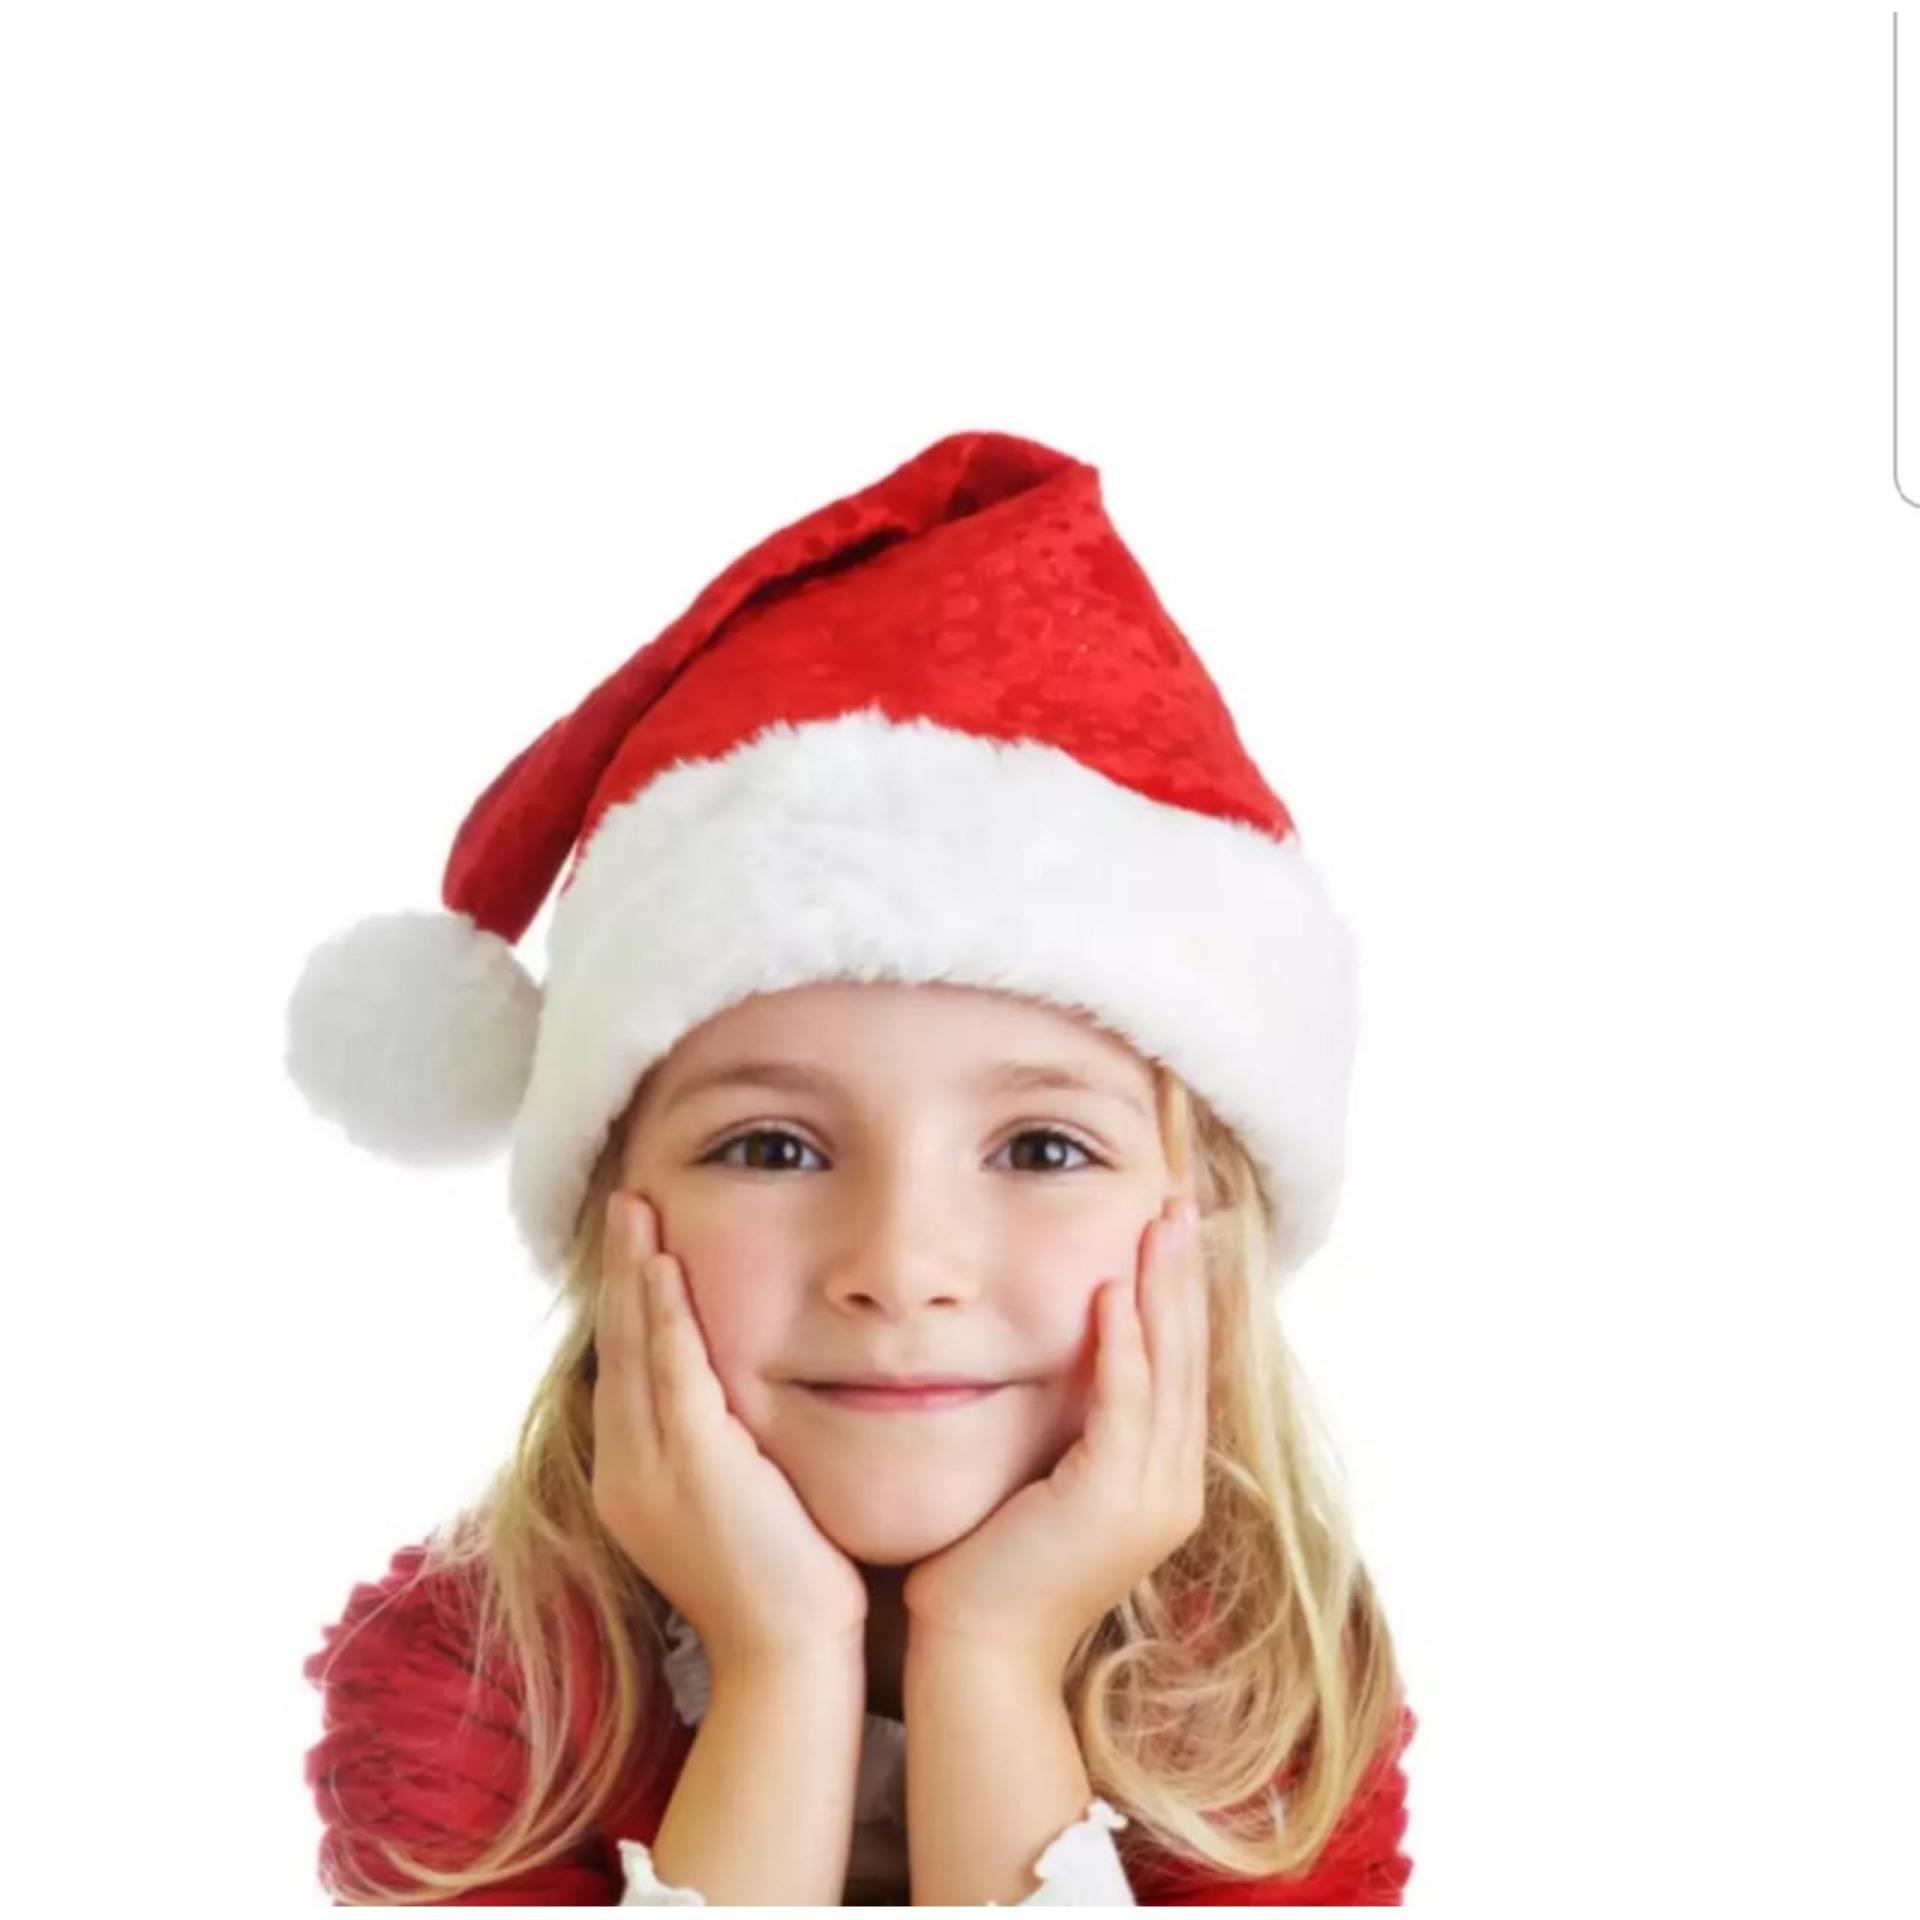 hemat murah   topi natal   topi santaclass   topi anak   fashion natal 56dc8858d4